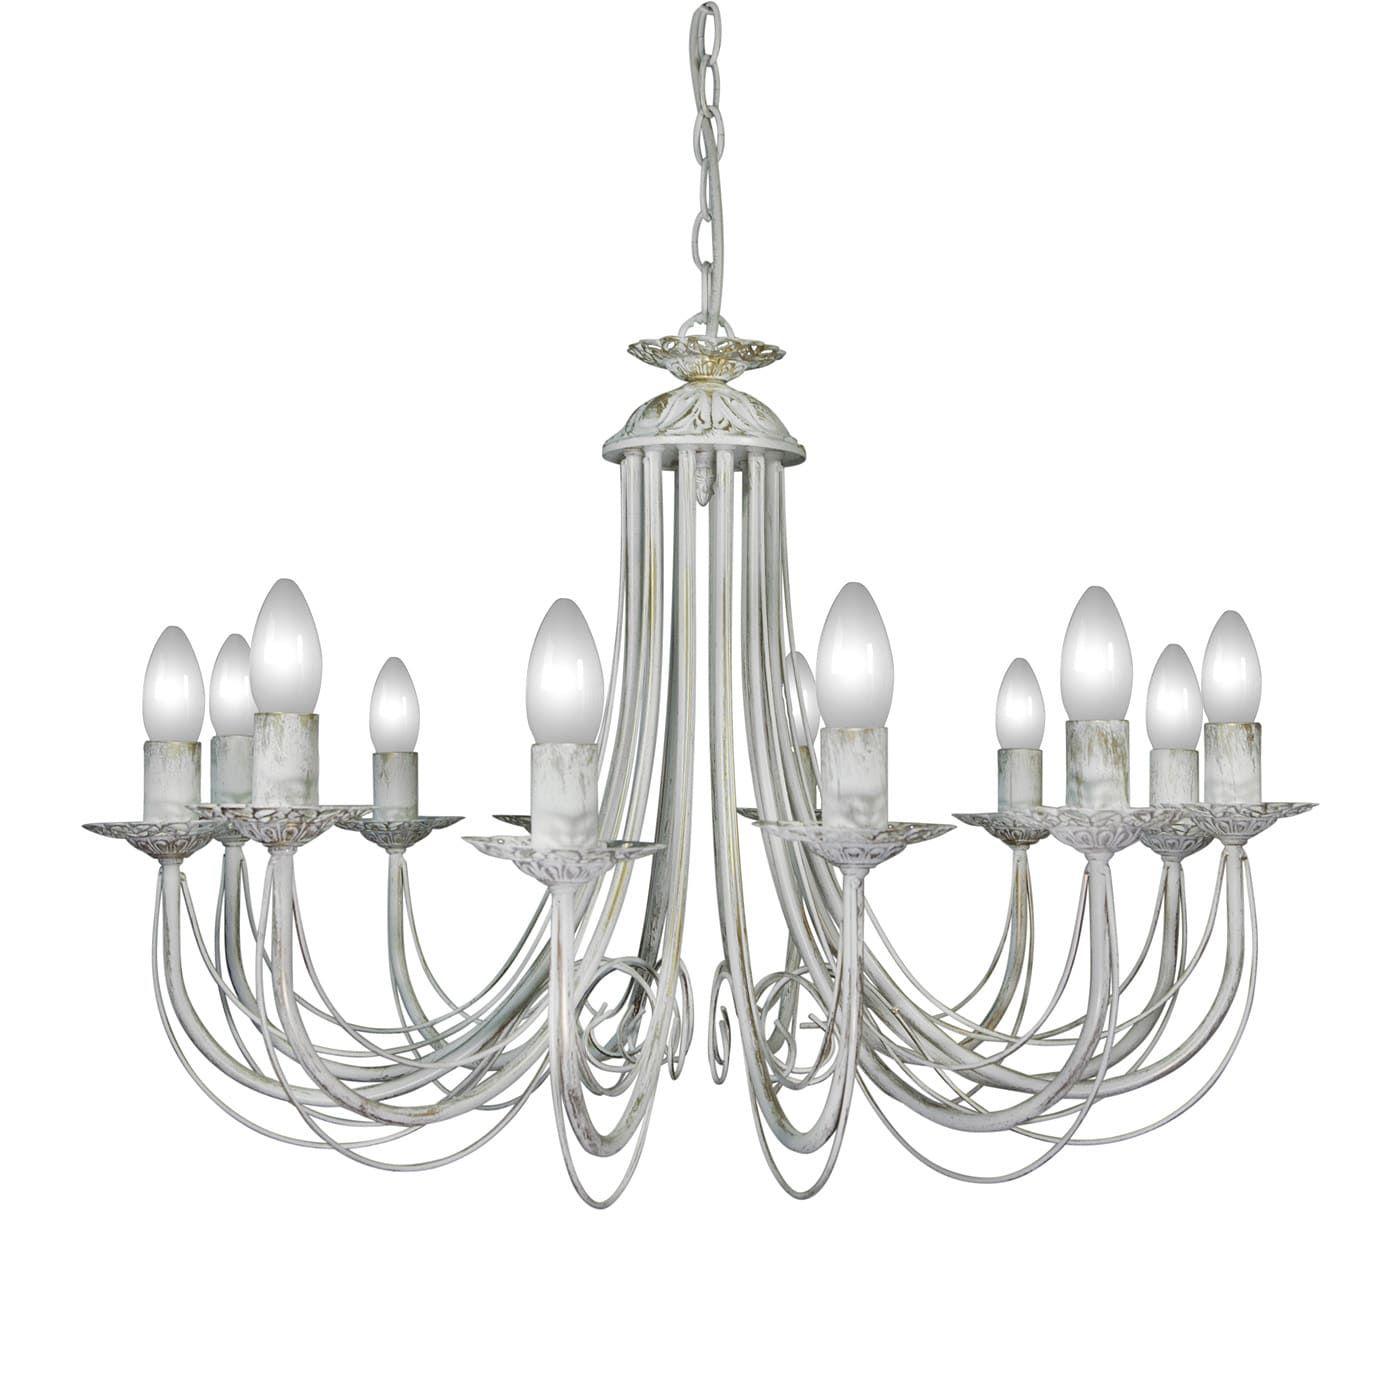 PETRASVET / Pendant chandelier S1165-12, 12xE14 max. 60W